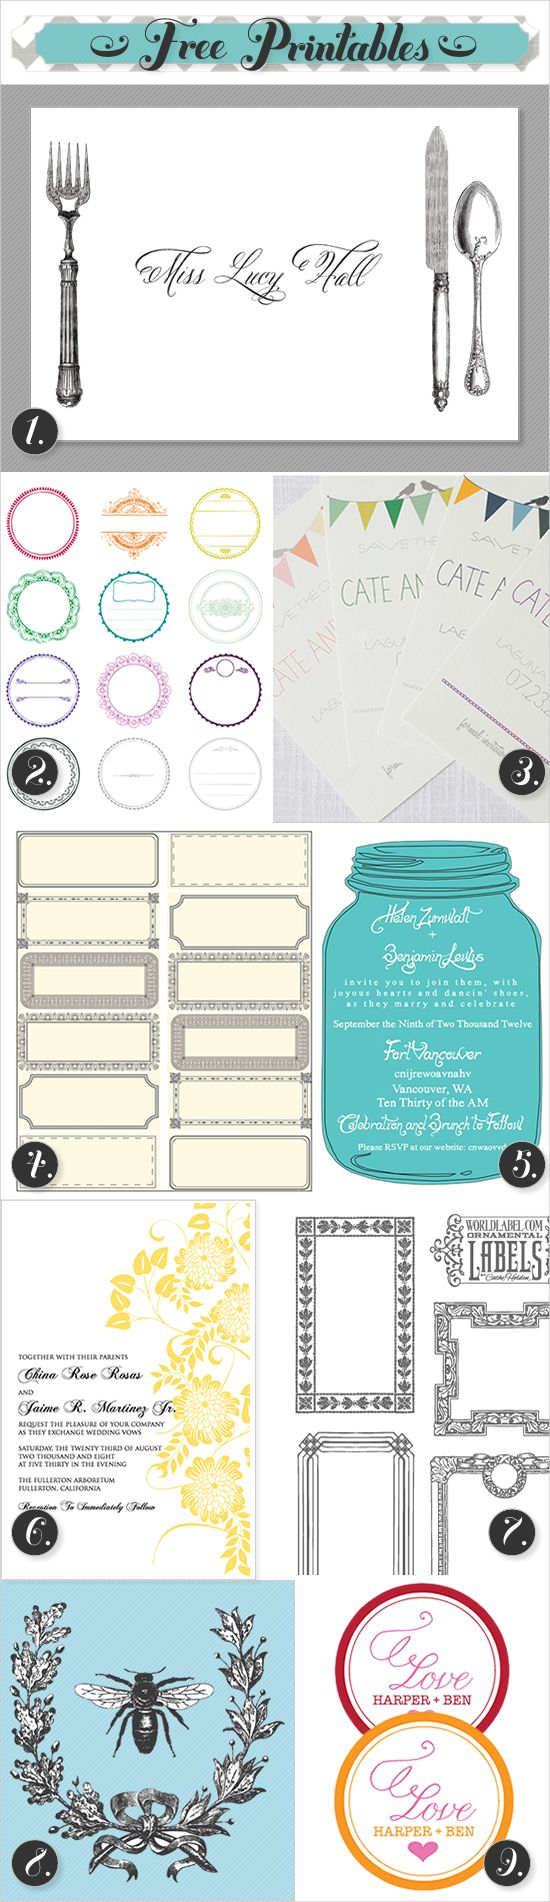 Free Printable Invitations | Pinterest | Imprimibles, Etiquetas y Papel